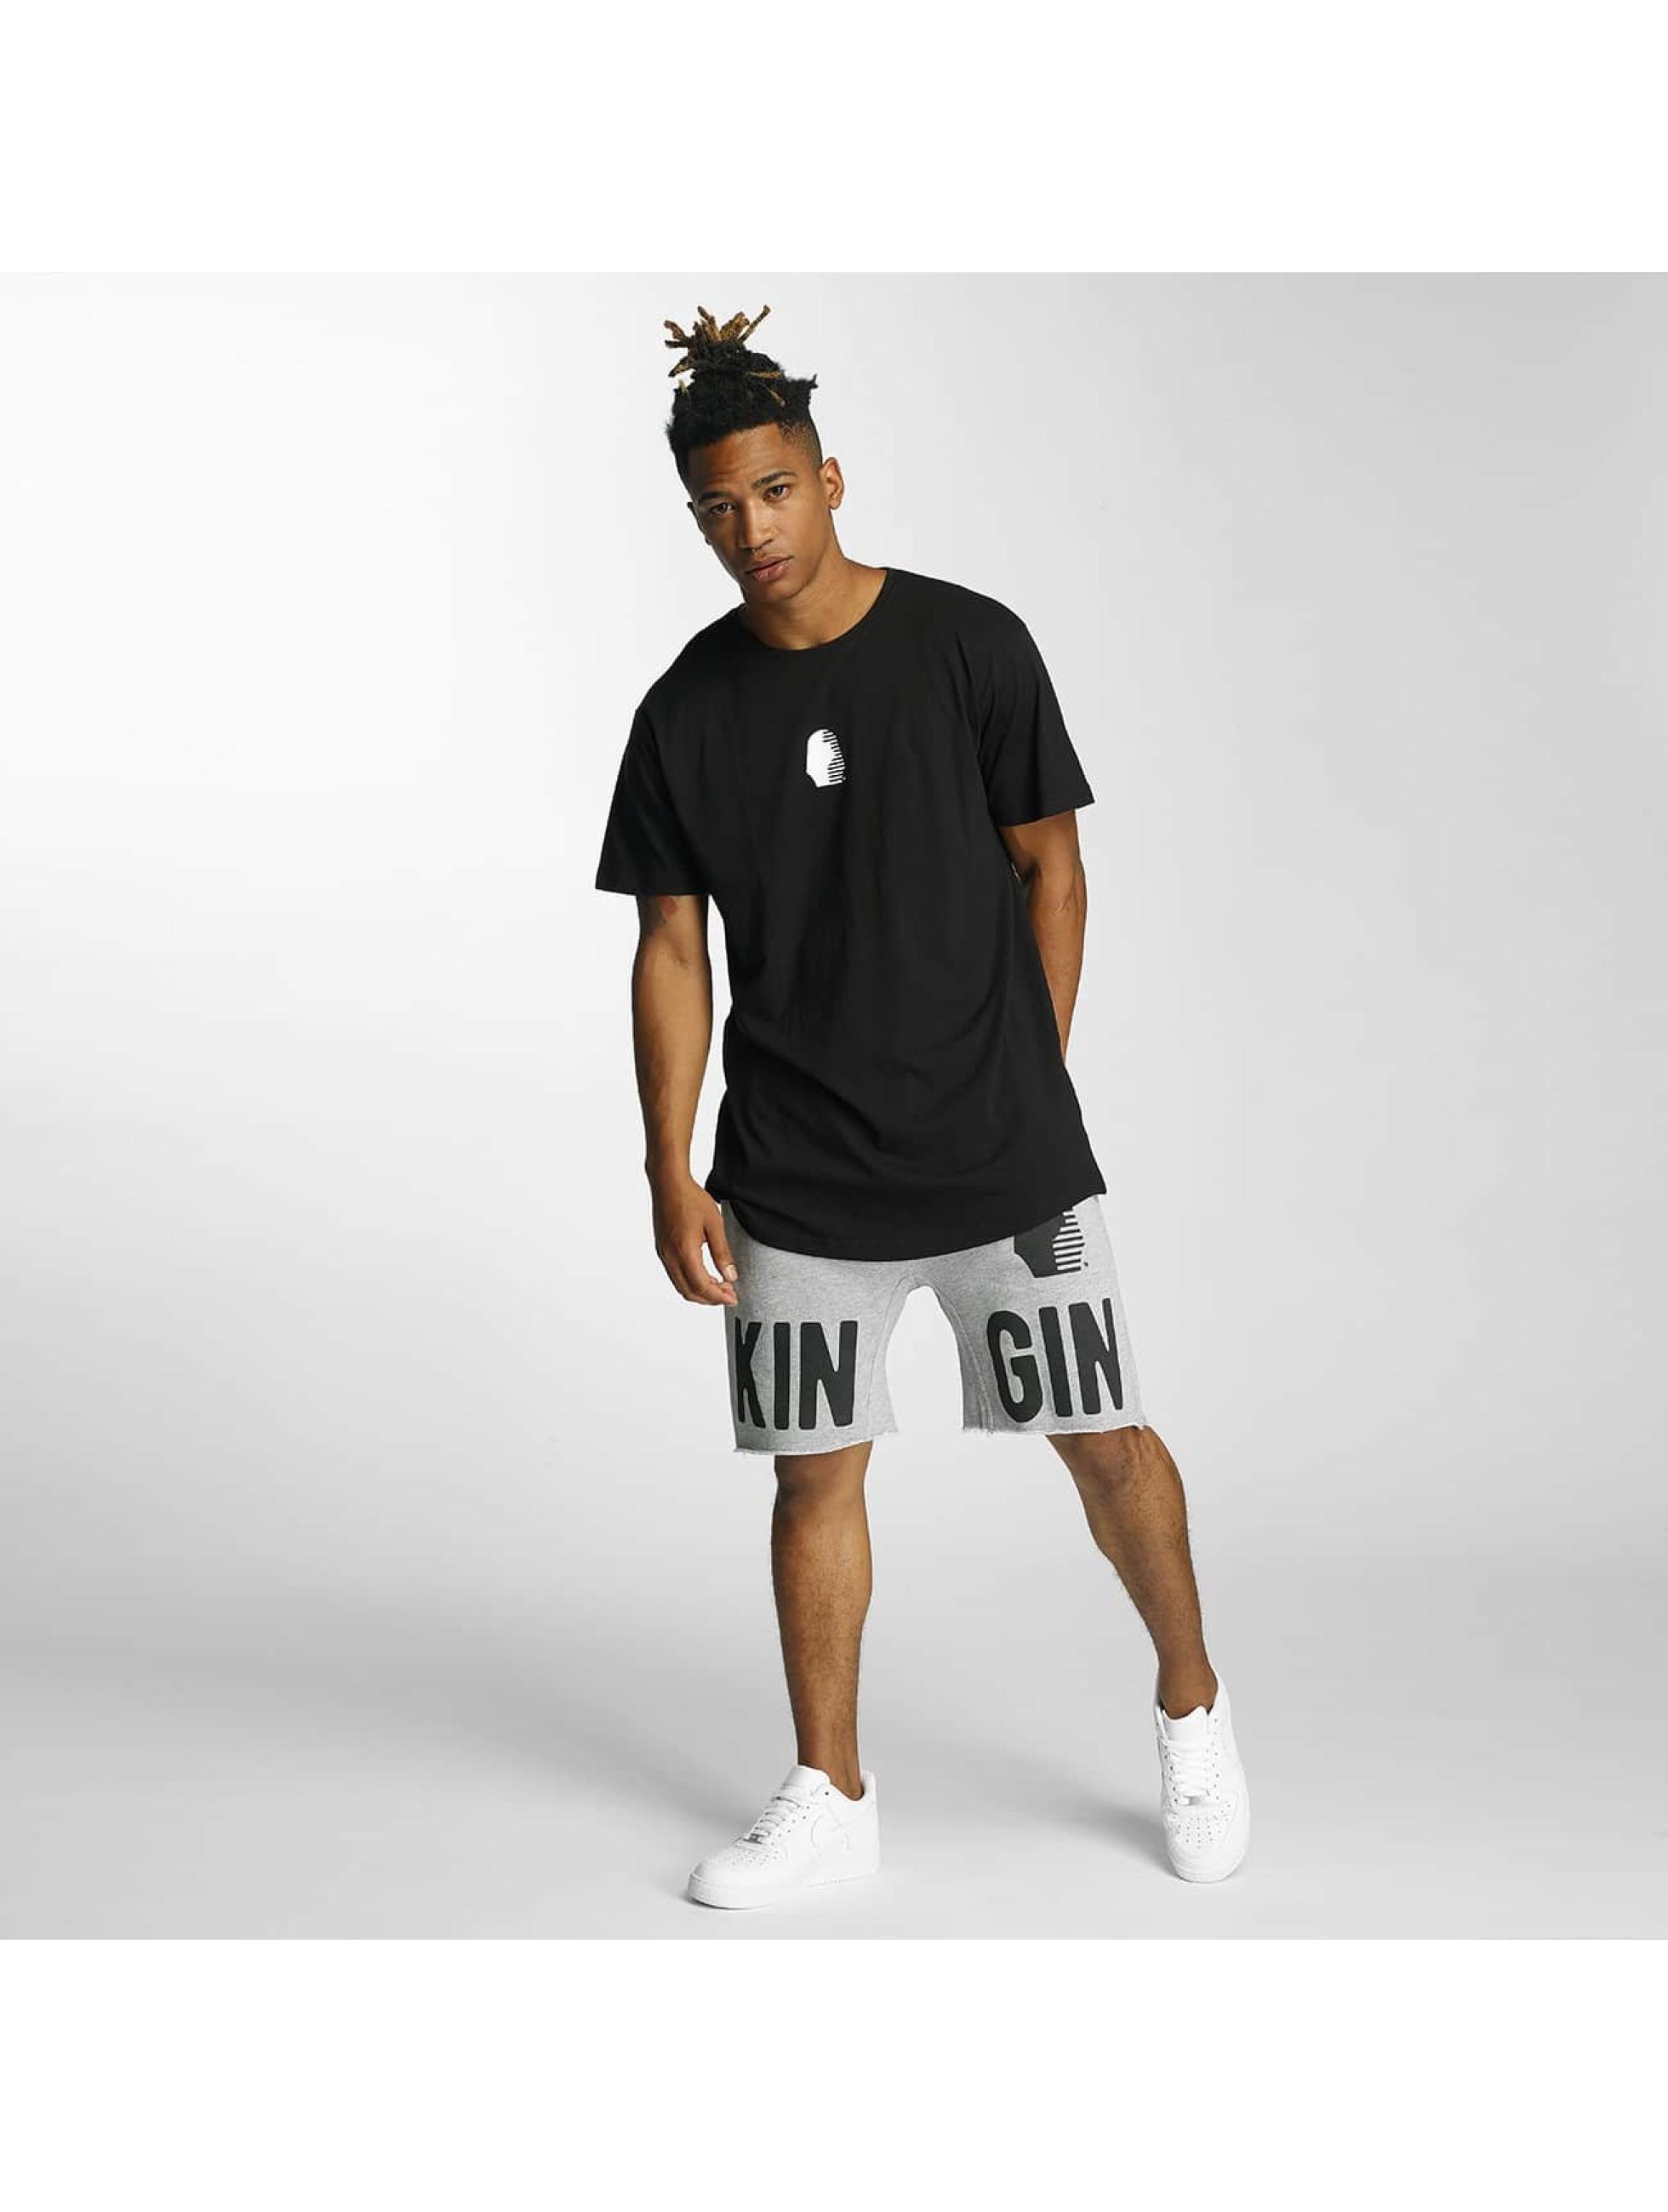 Kingin T-shirts Comp. sort